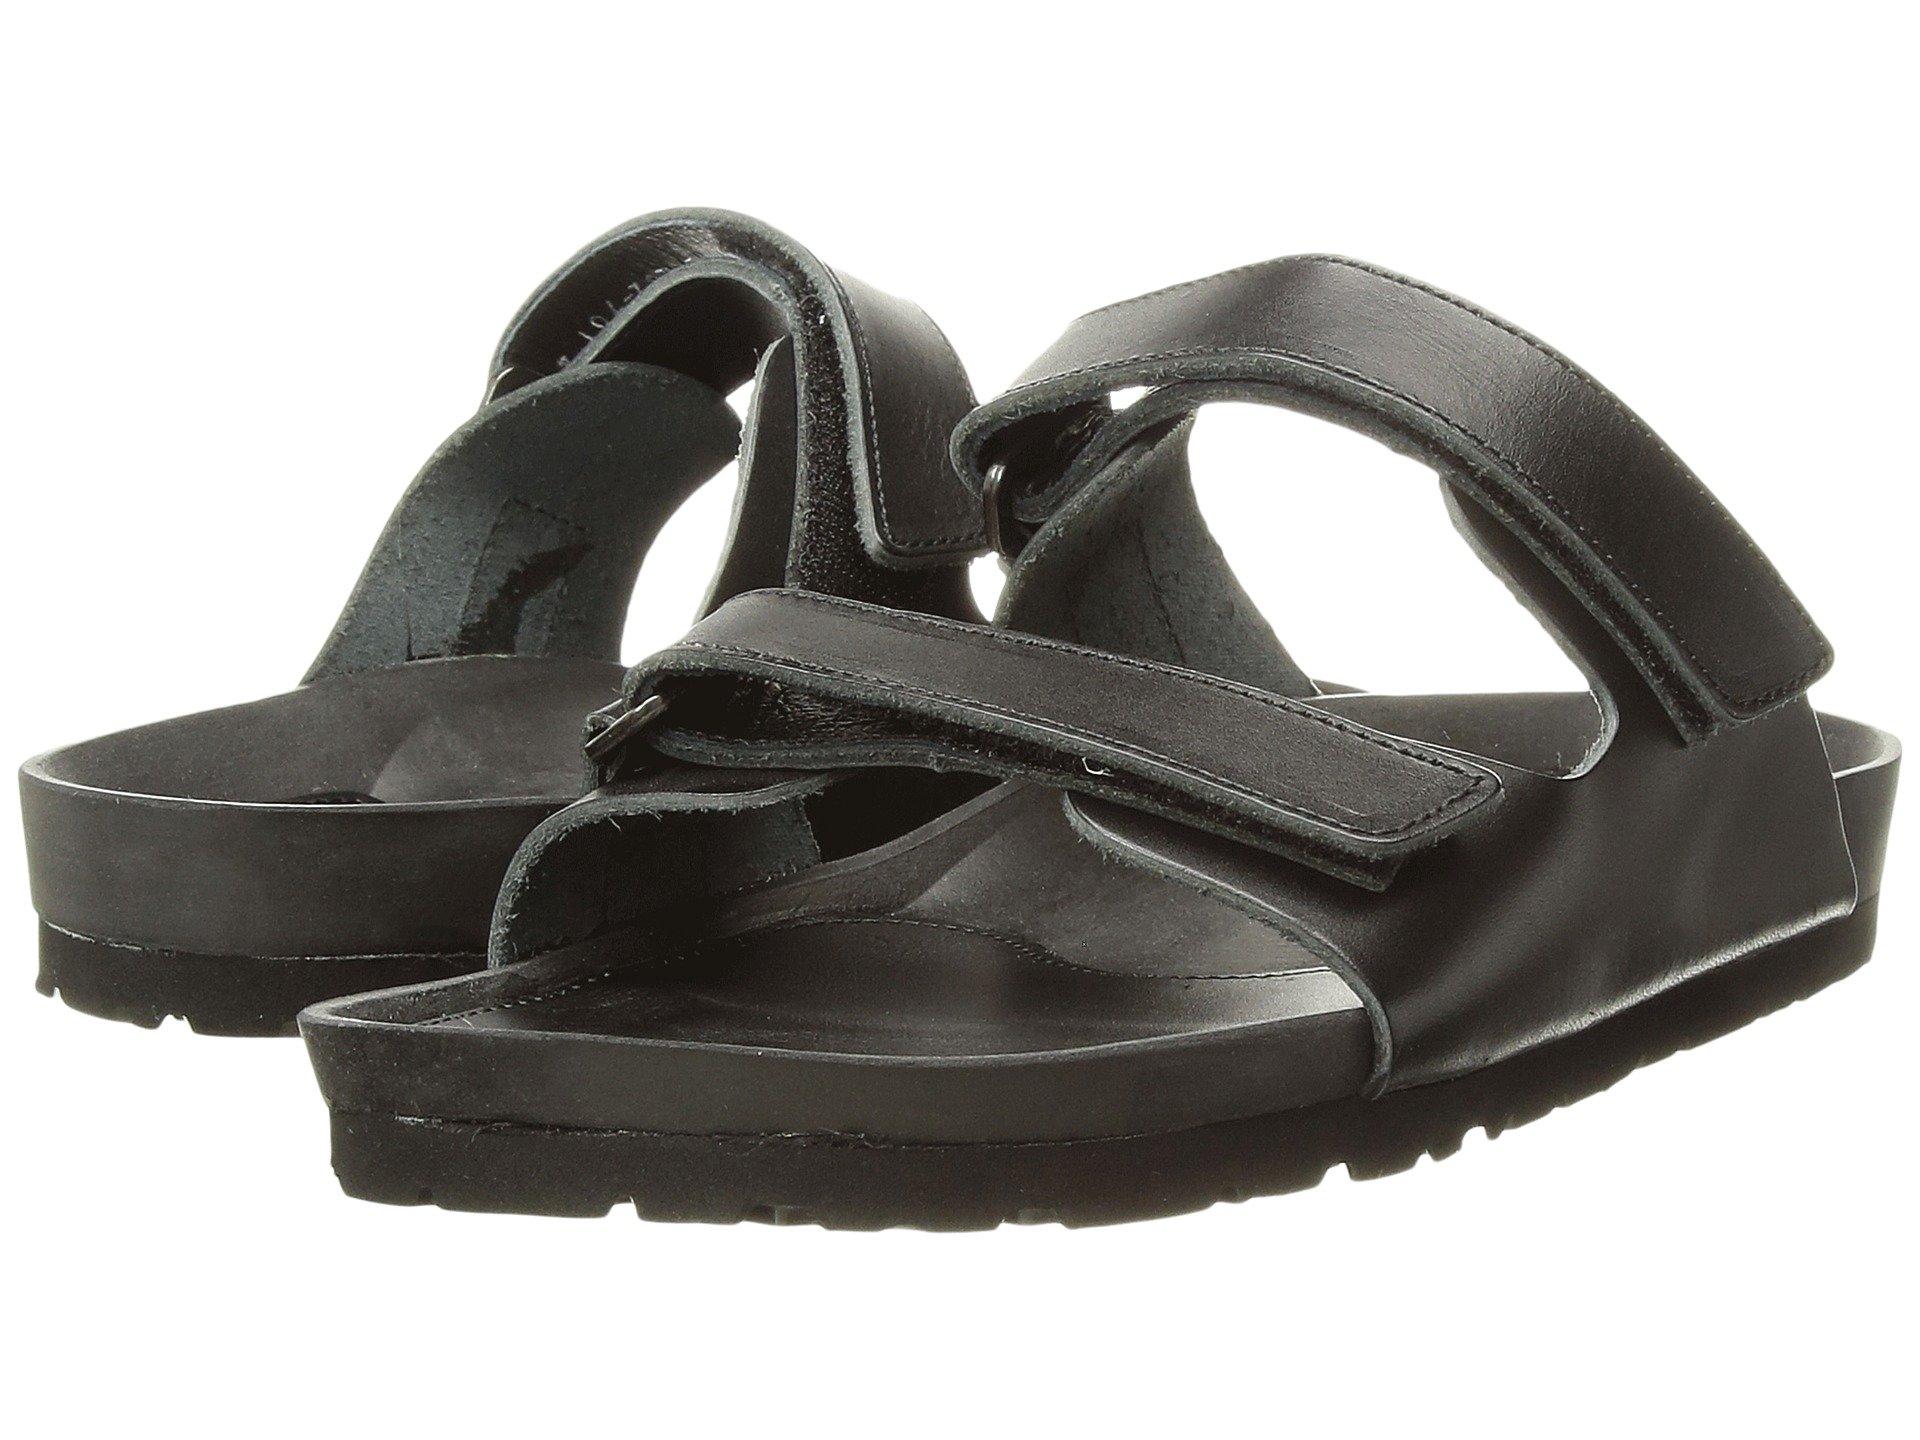 Sandalias para Mujer Yand#39;s by Yohji Yamamoto Hook-and-Loop Sandals  +